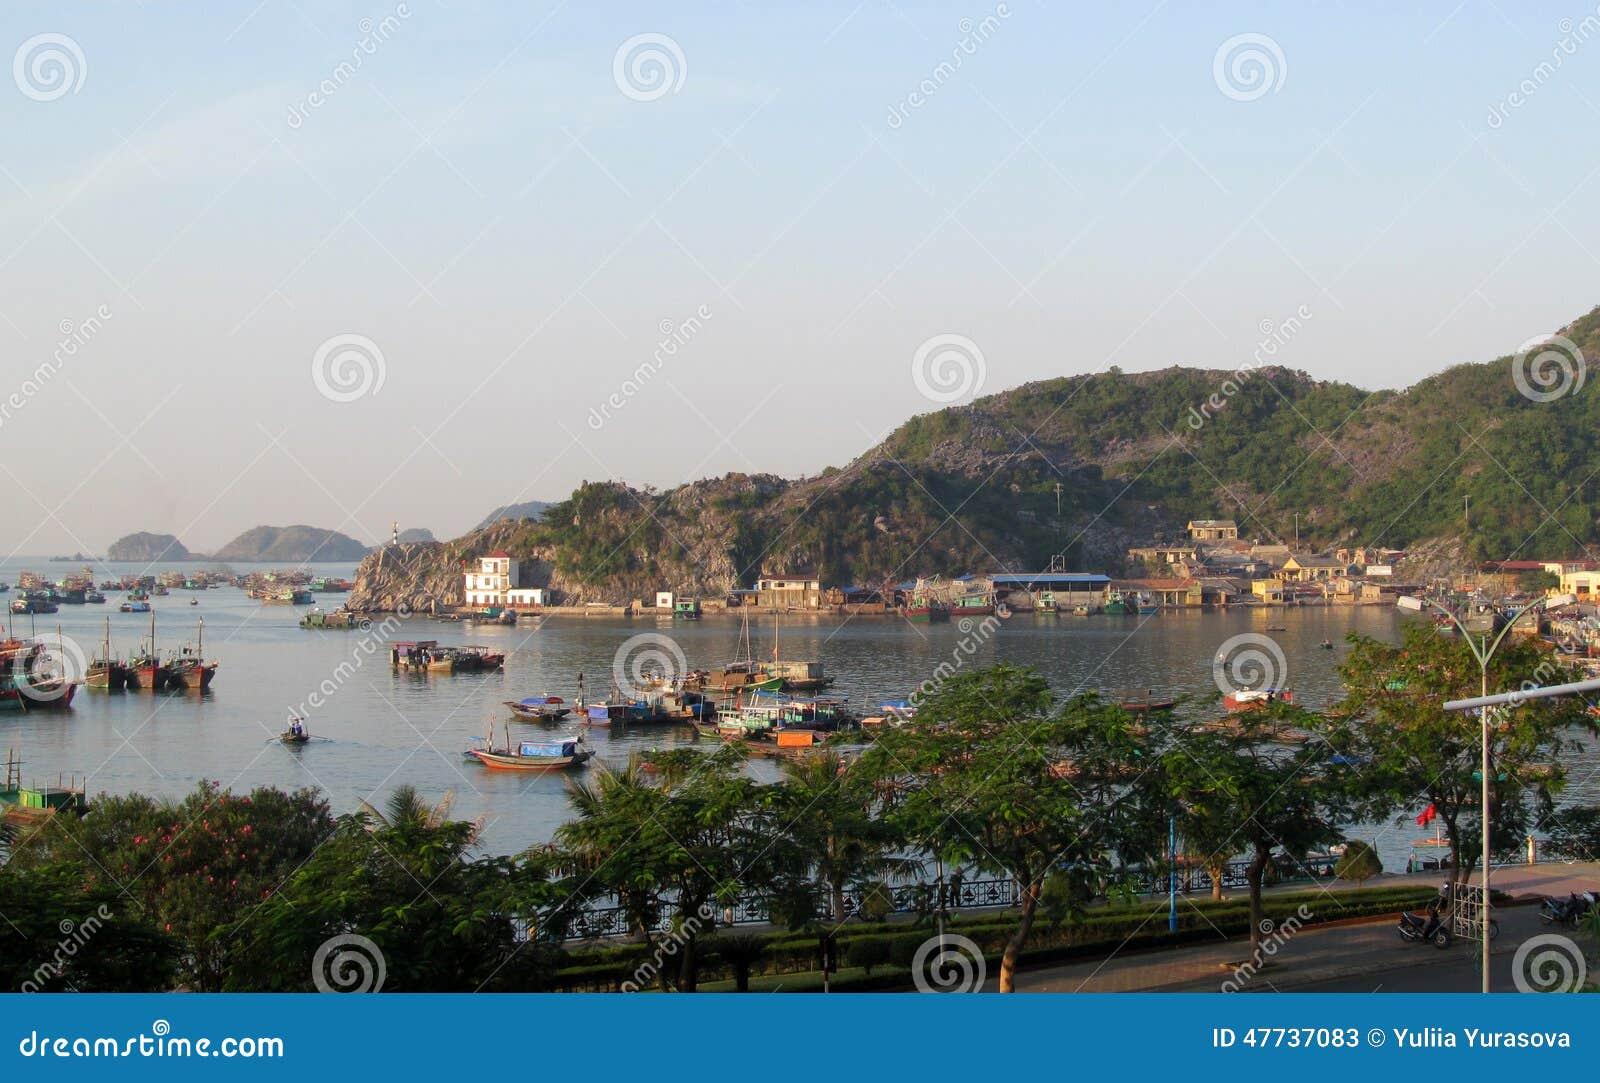 House boats in Ha Long Bay near Cat Ba island, Vietnam